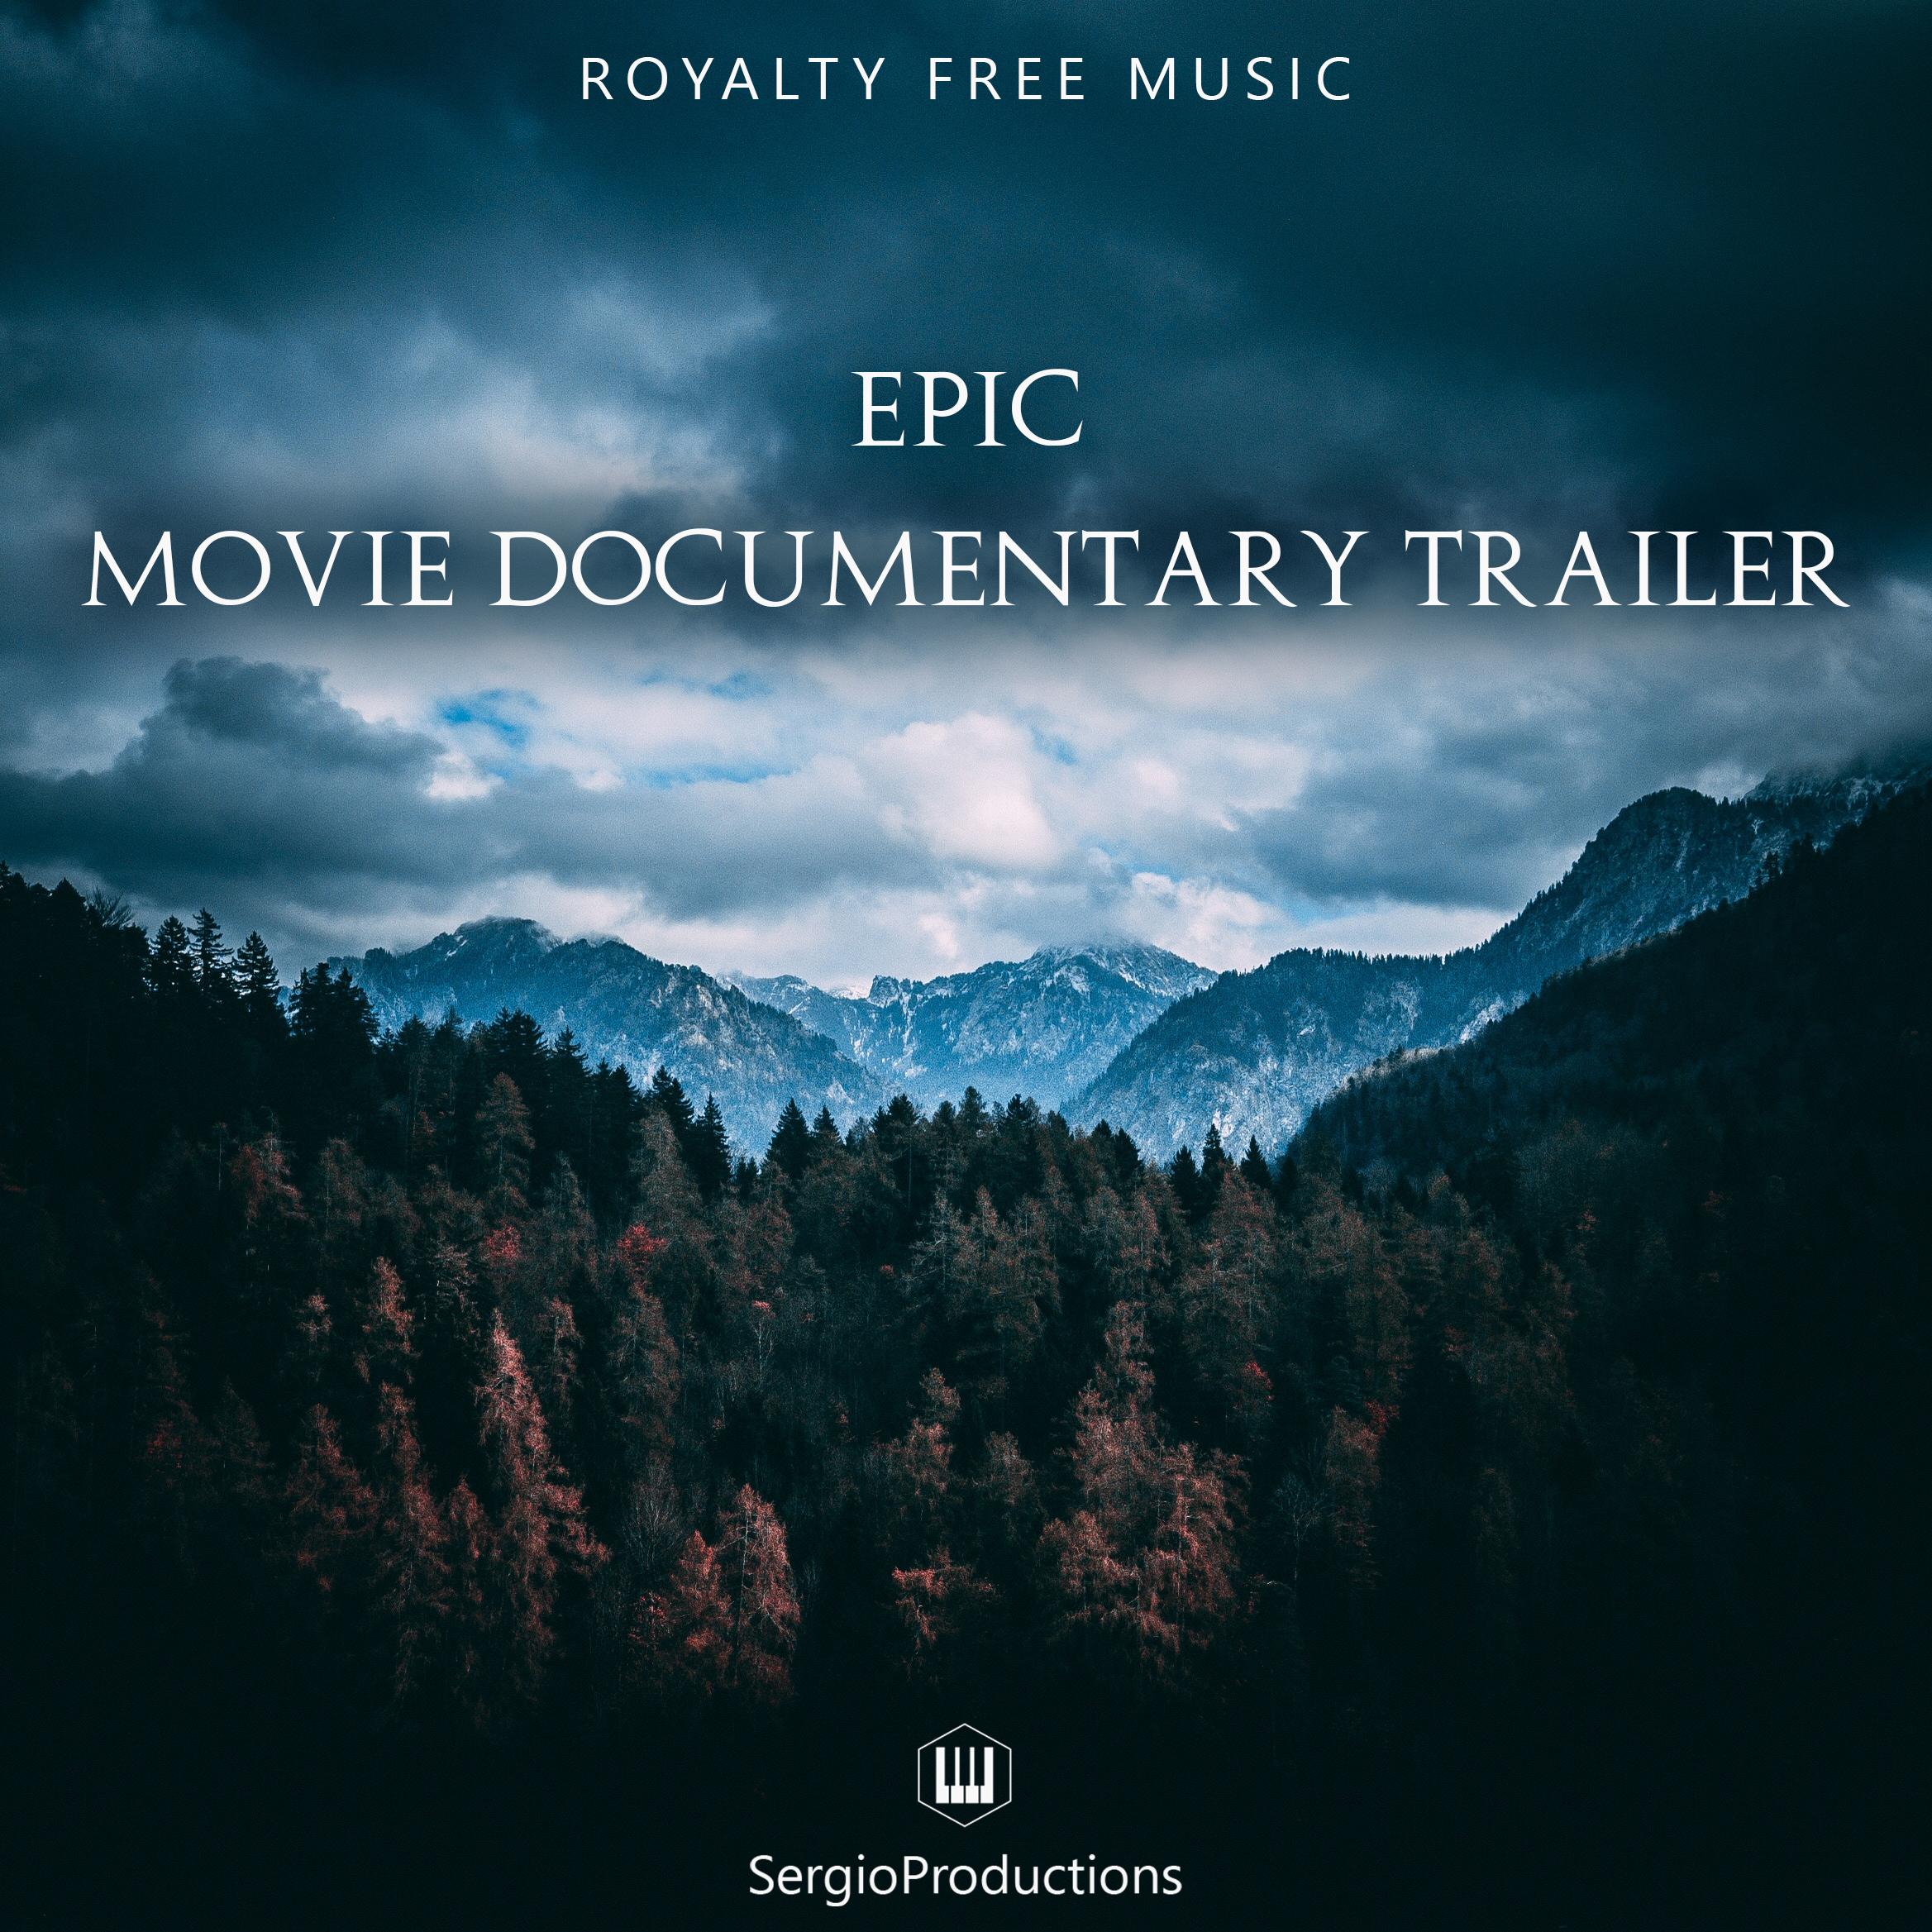 Epic-Movie-Documentary-Trailer